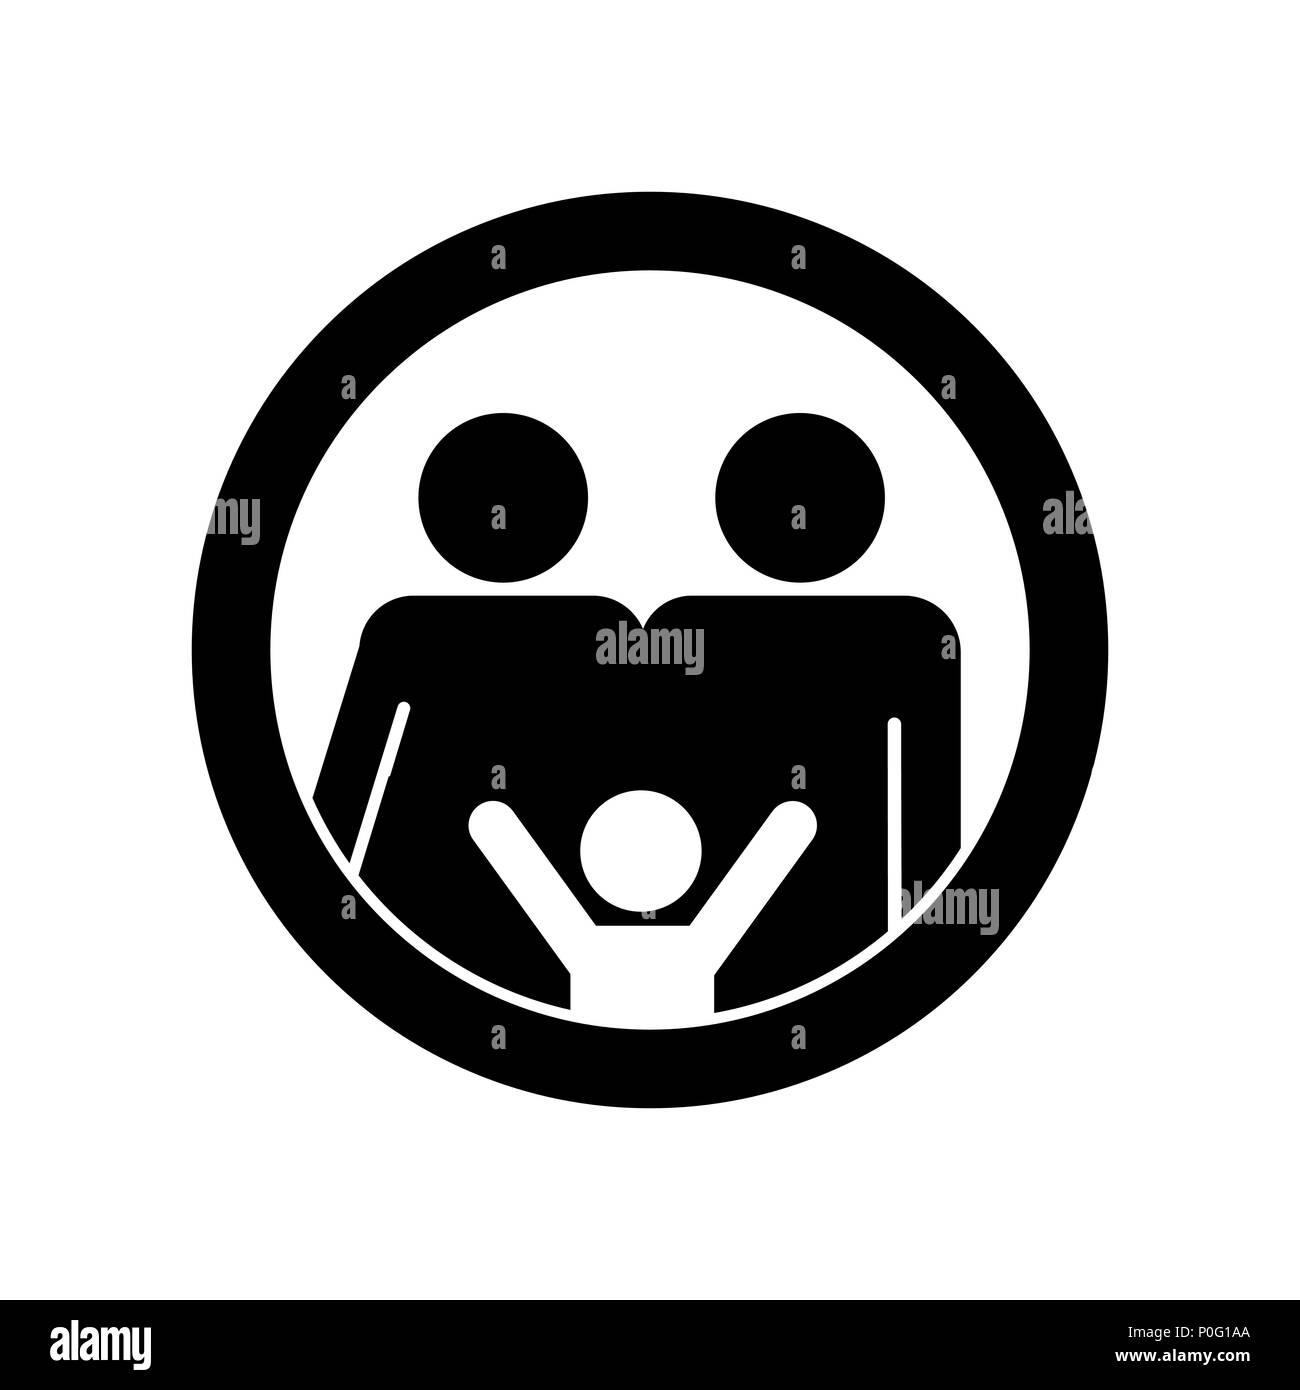 Family Symbol Black And White Stock Photos Images Alamy